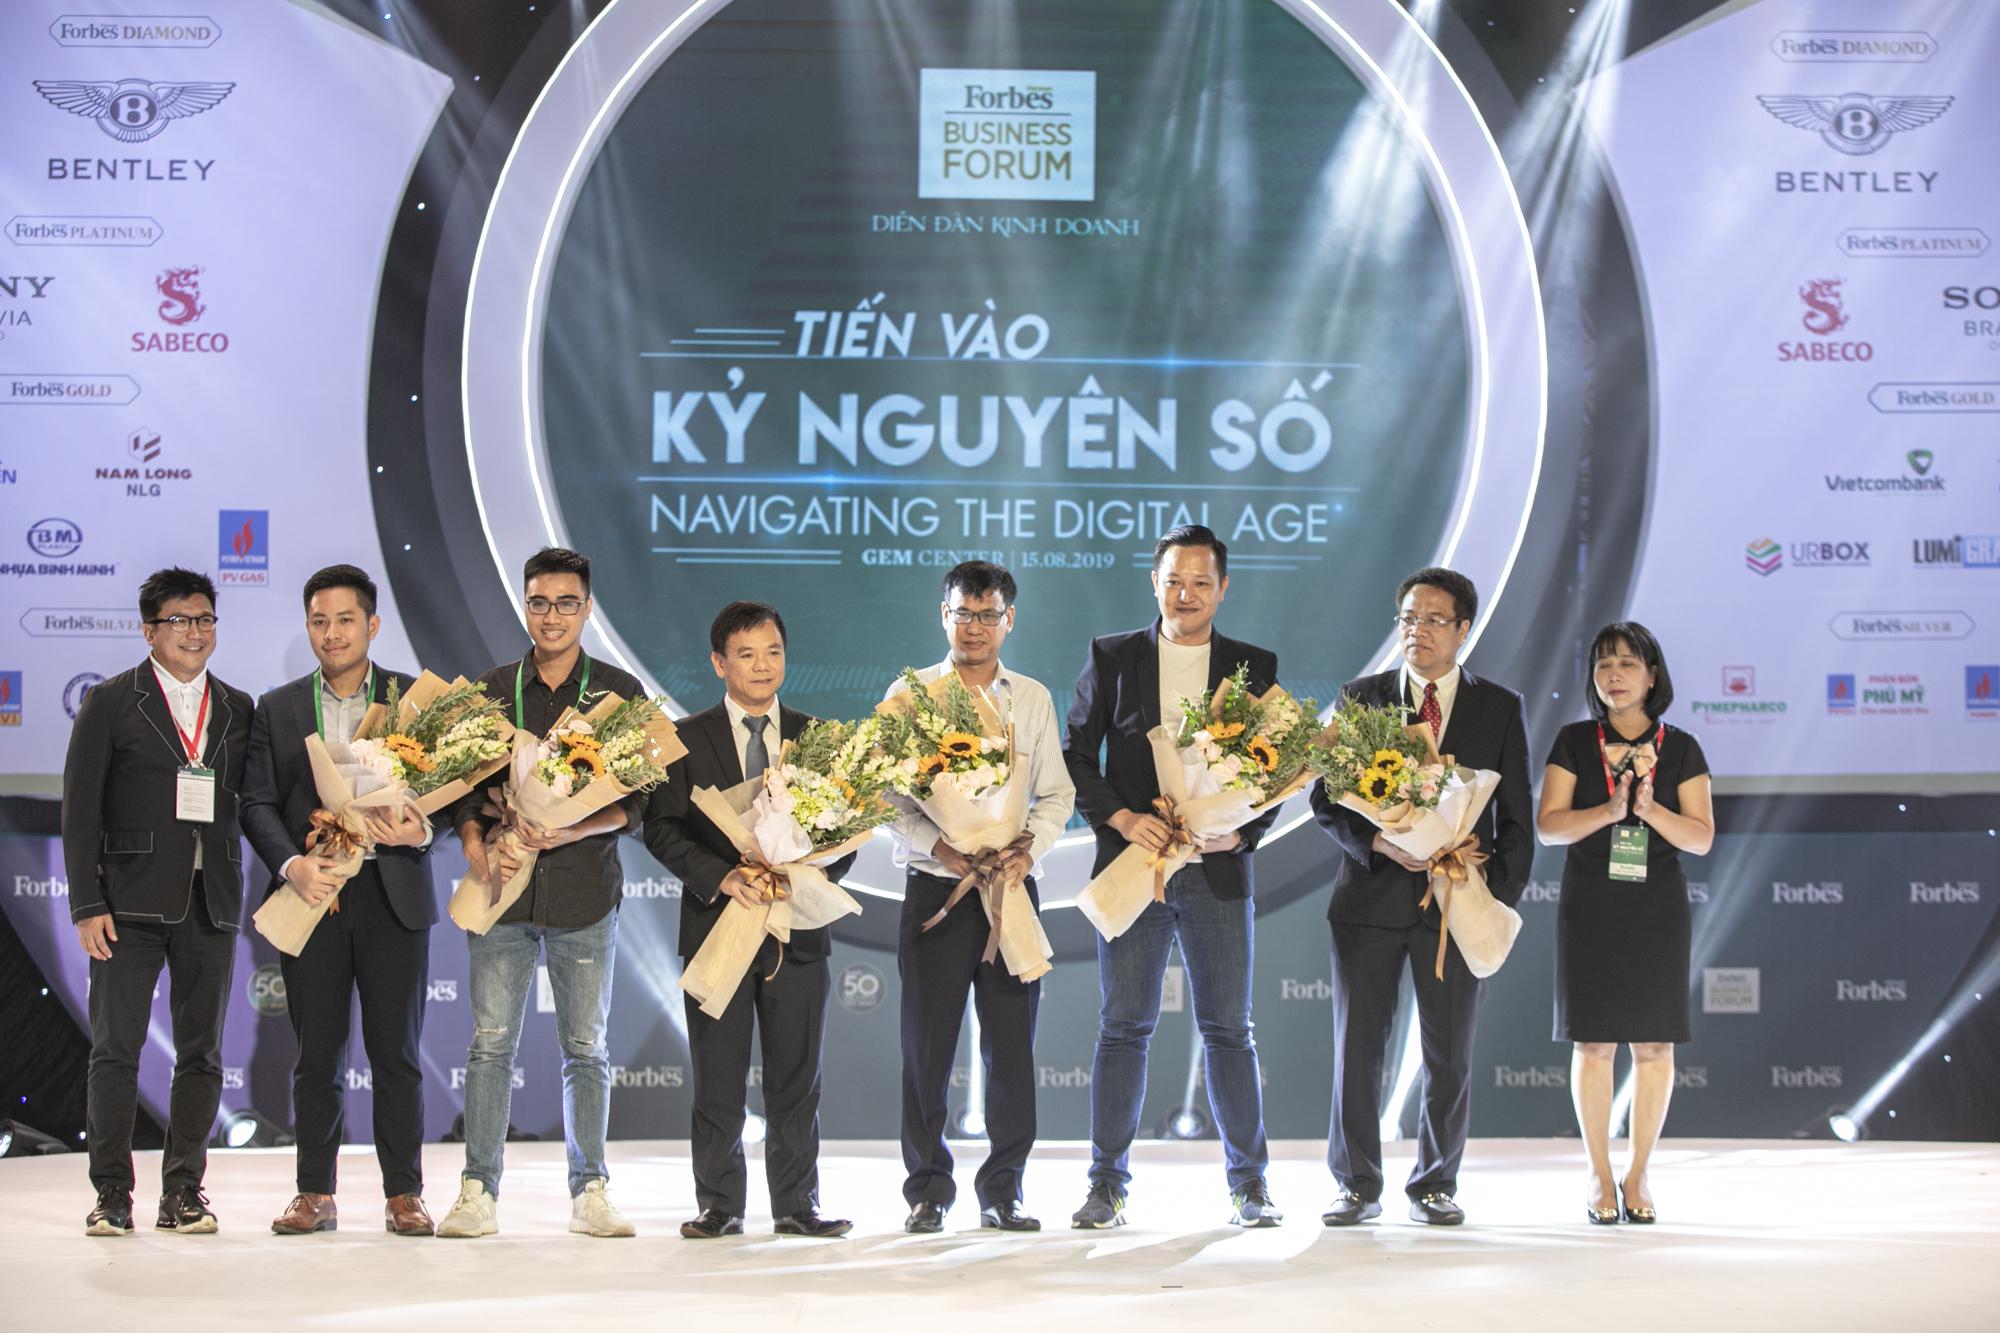 pv gas lan thu 7 lien tiep nhan vinh danh cua forbes top 50 cong ty niem yet tot nhat viet nam nam 2018